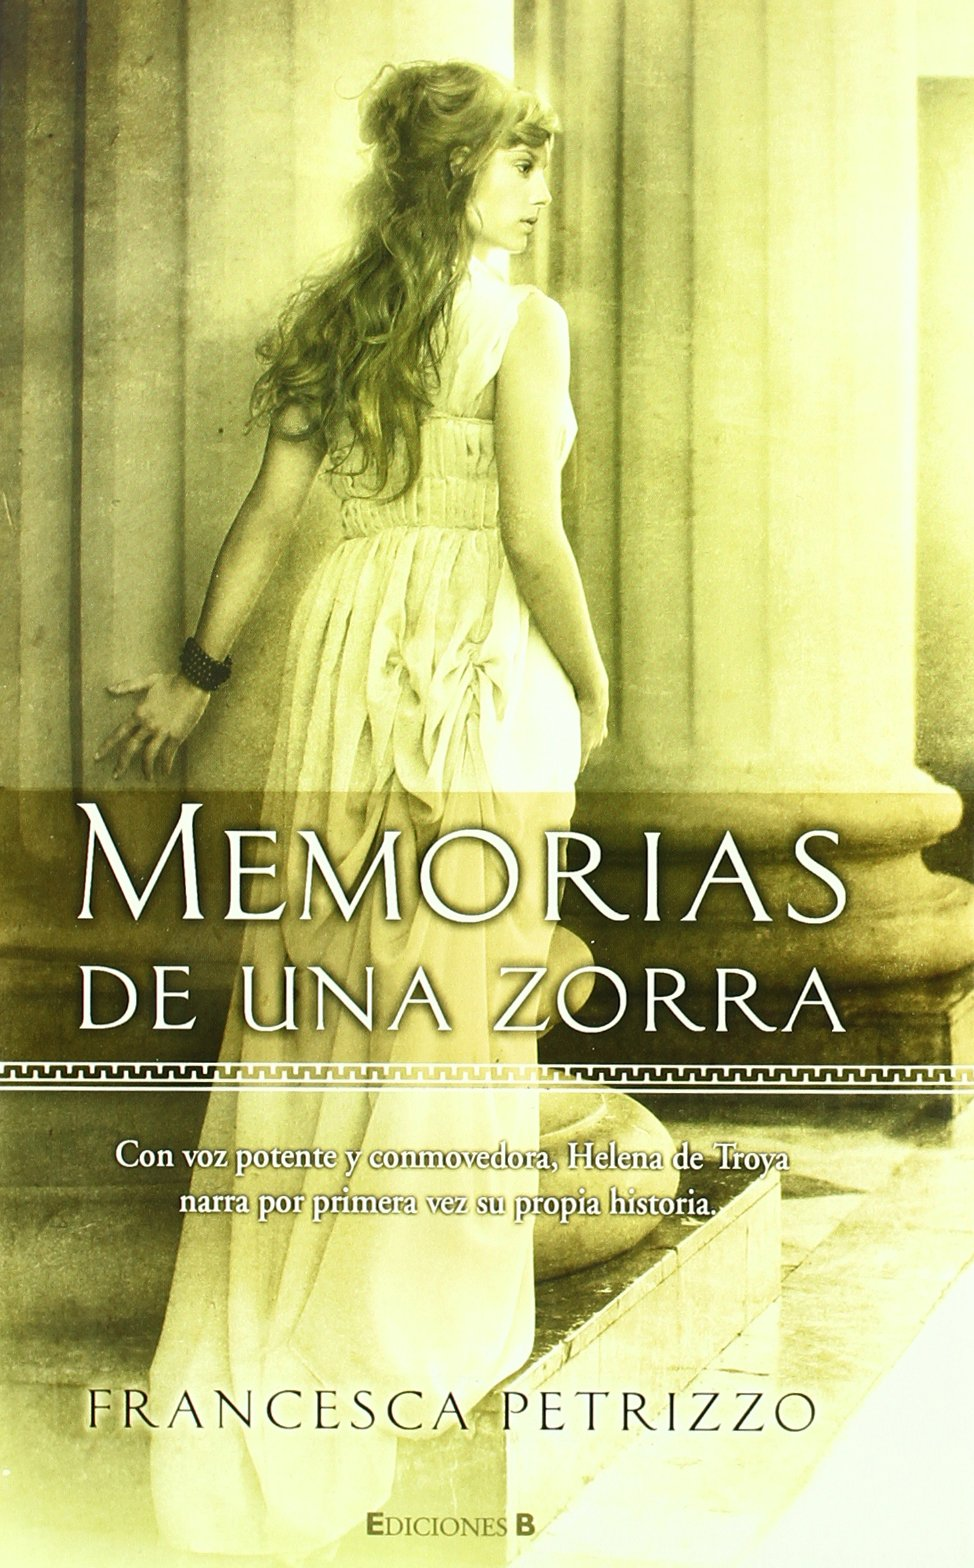 Memorias de una zorra (HISTÓRICA) Tapa blanda – 18 oct 2010 Francesca Petrizzo B (Ediciones B) 8466644660 Mythology